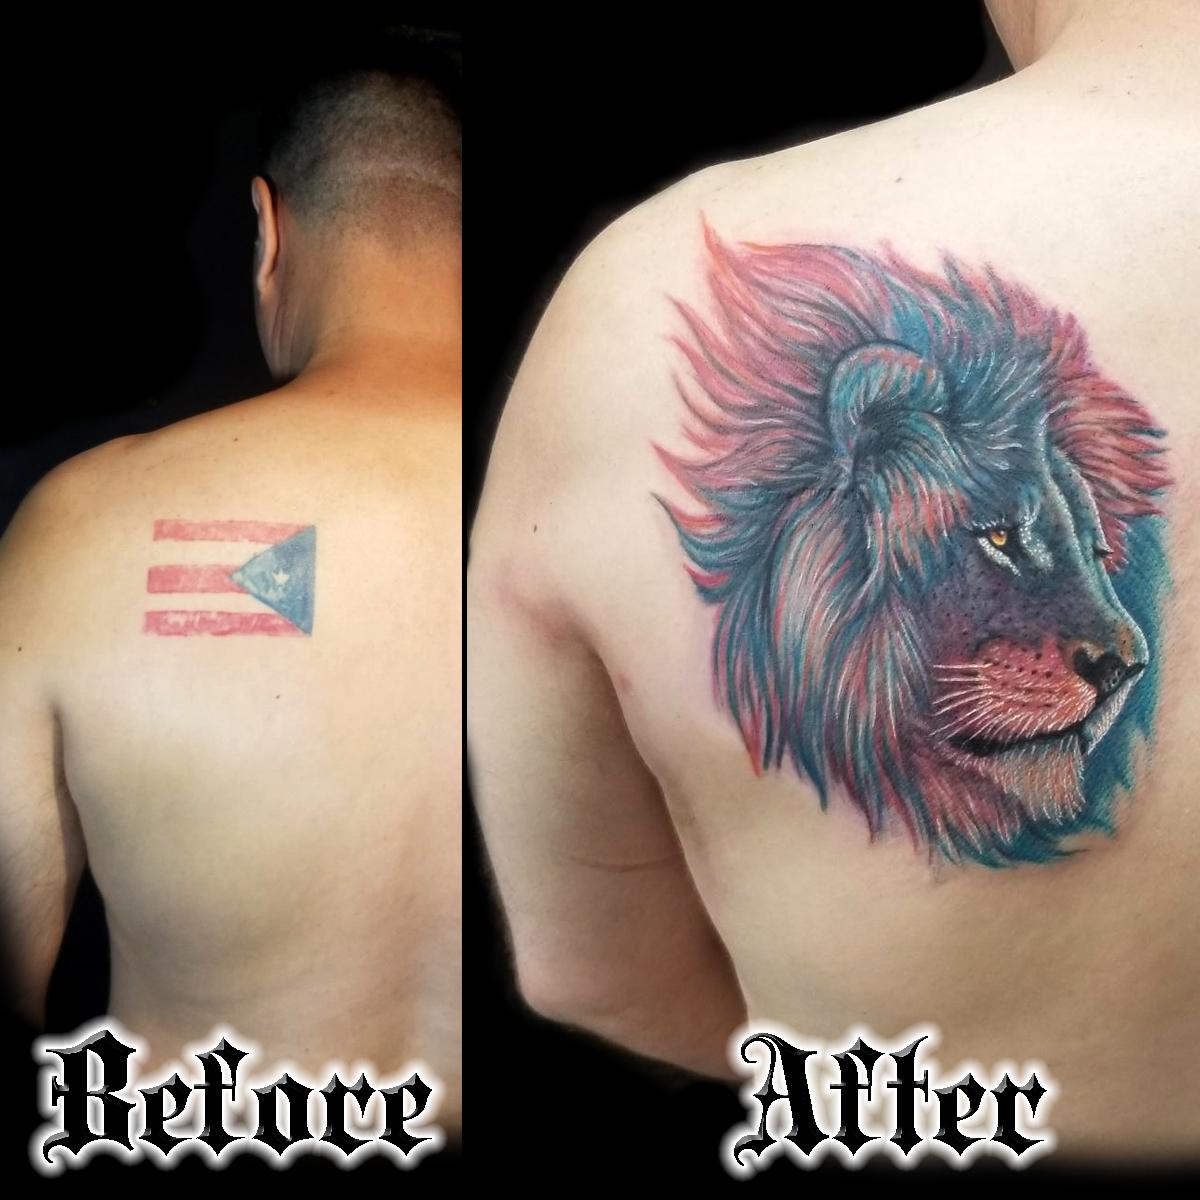 Cover Up Tattoos San Francisco